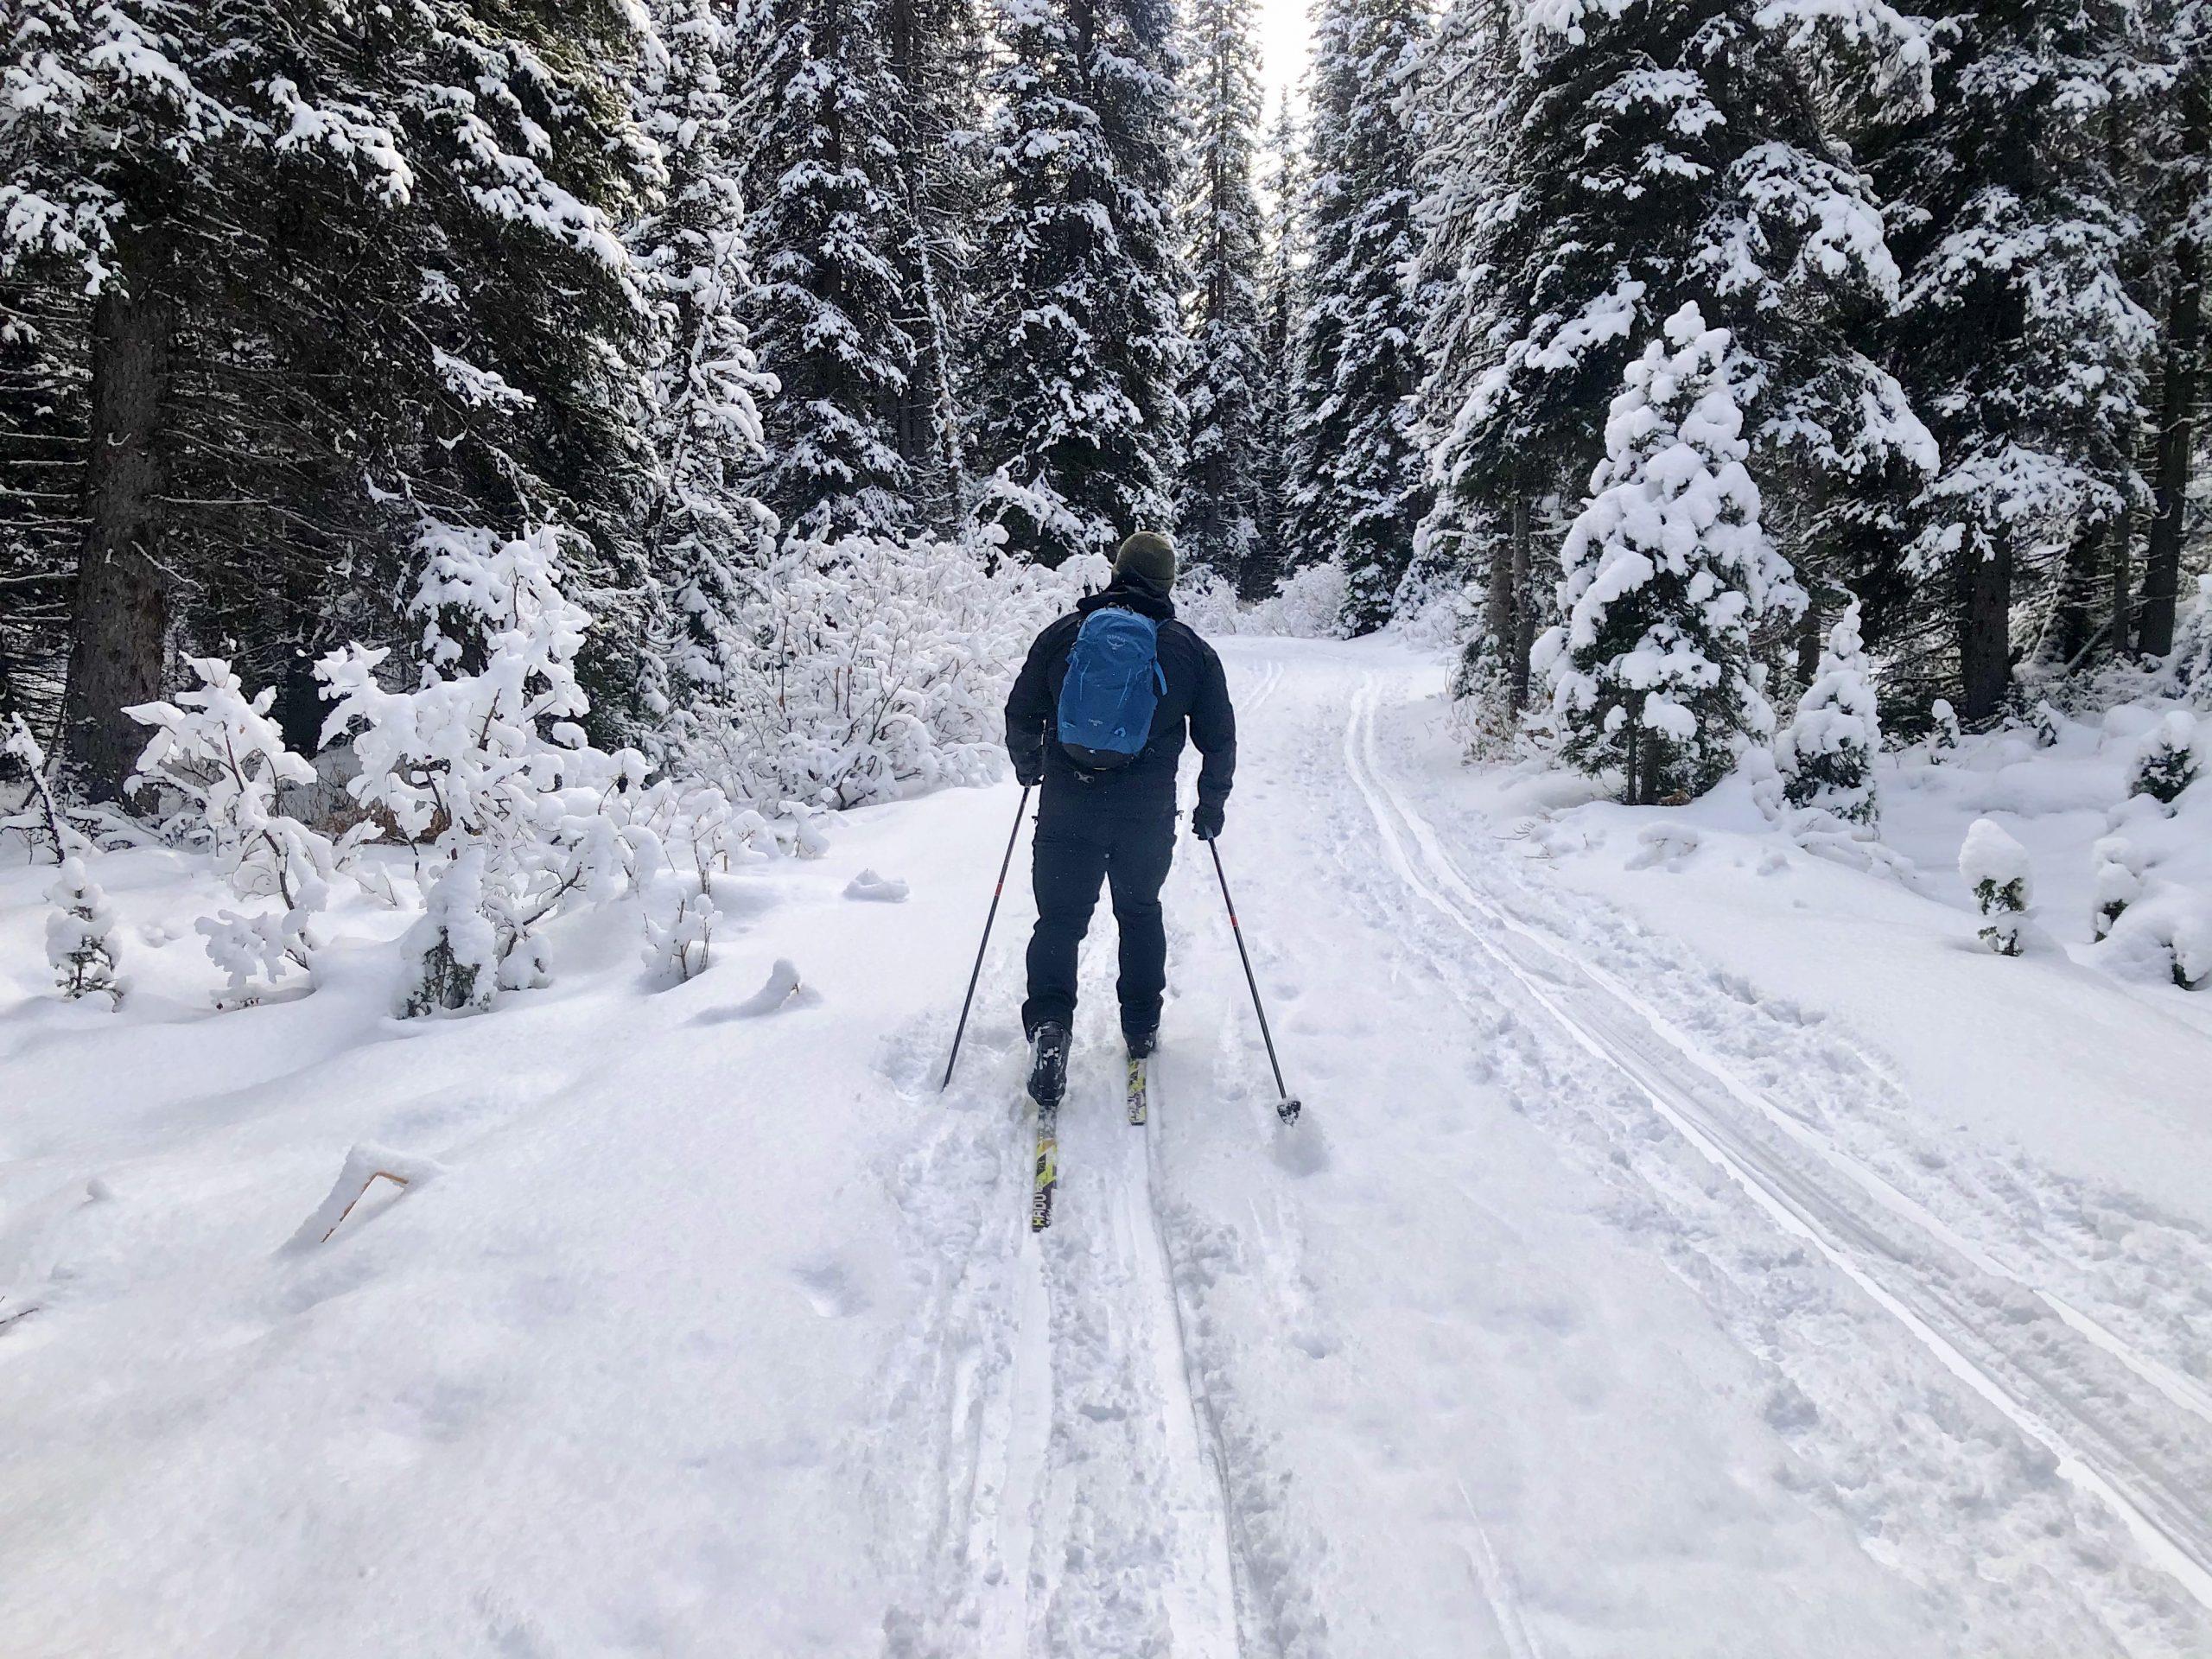 Ski via @outandacross